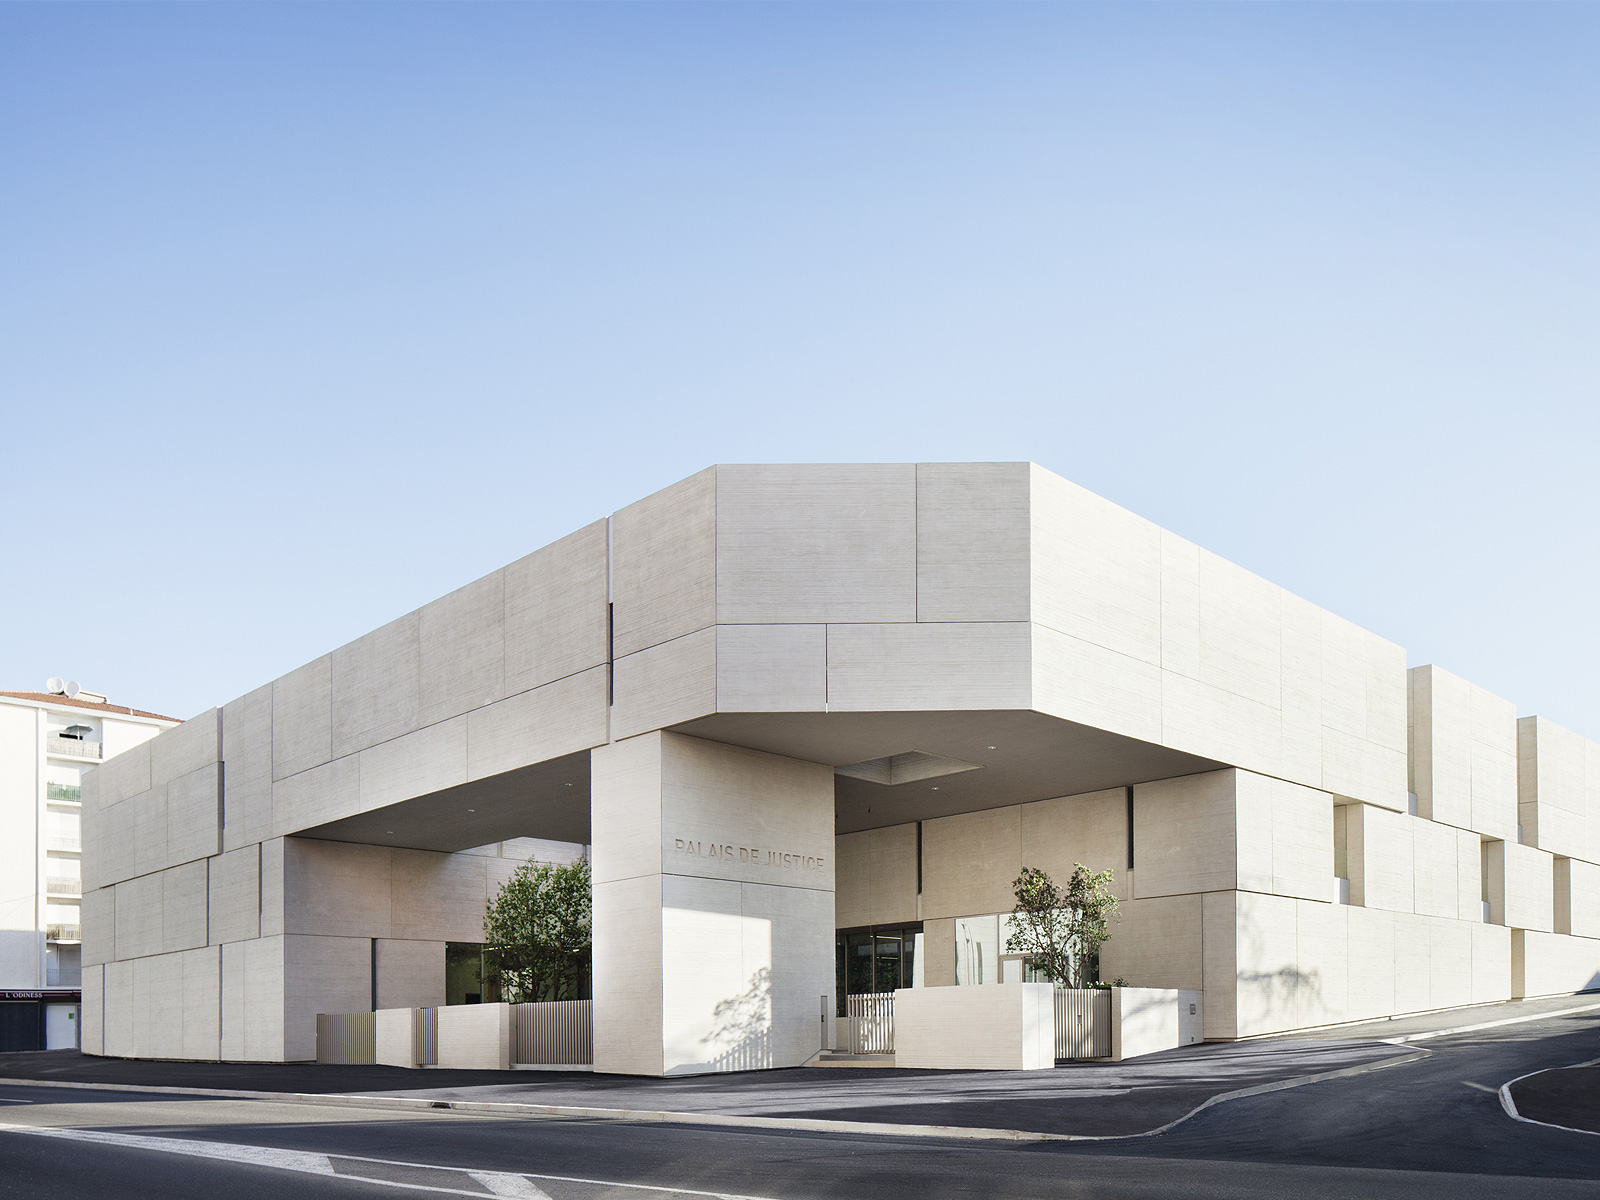 best architects architektur award 2 3 4 architecture urbanisme paysage 2 3 4. Black Bedroom Furniture Sets. Home Design Ideas